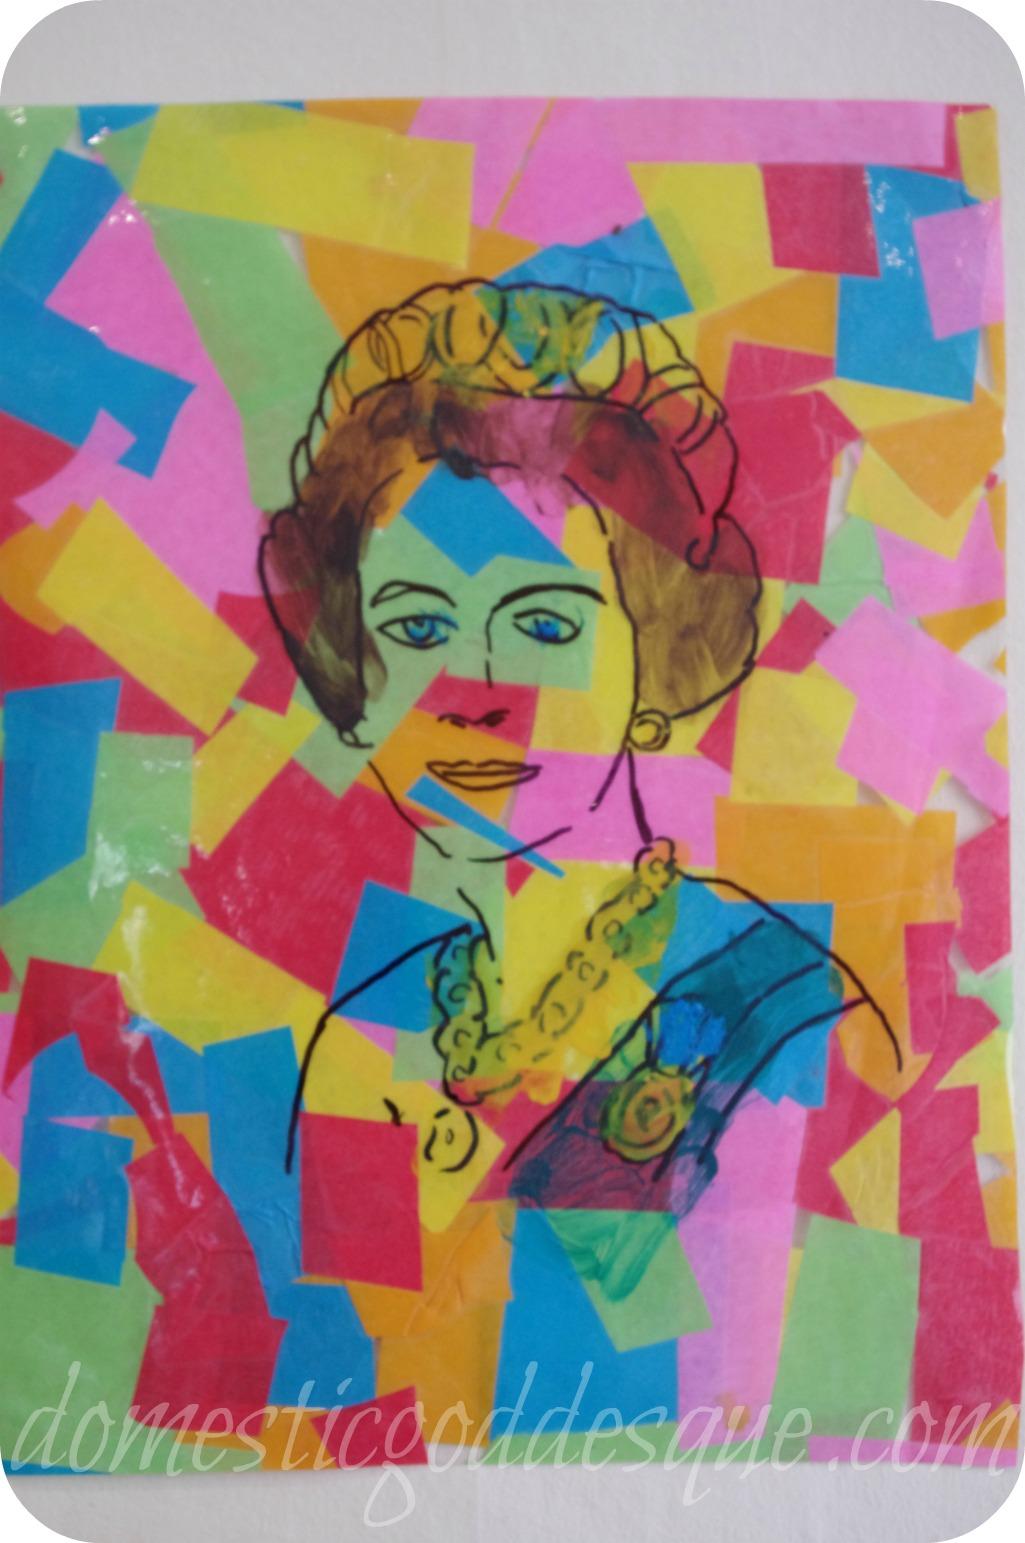 queen pop art after warhol jubilee craft fun family crafts